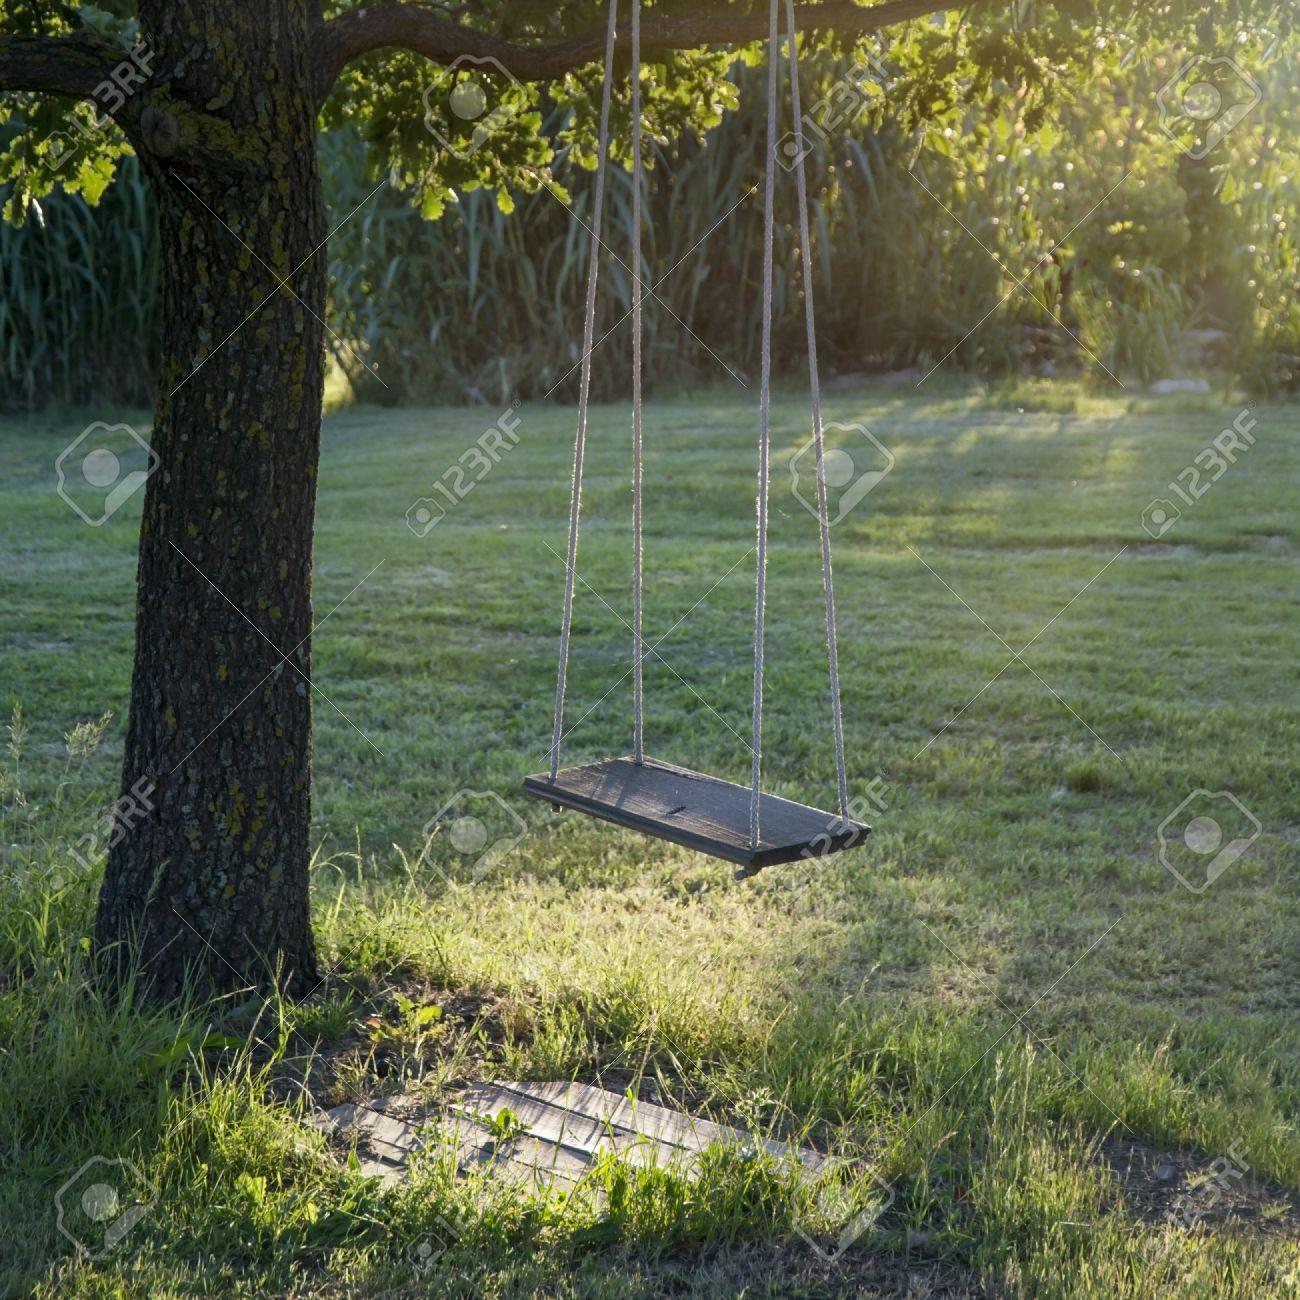 Full Size of Schaukel Garten Baby Gartenliege Holz Test Ohne Betonieren Selber Bauen Gartenschaukel Metall Gartenpirat Erwachsene Trampolin Pavillion Sonnenschutz Garten Schaukel Garten